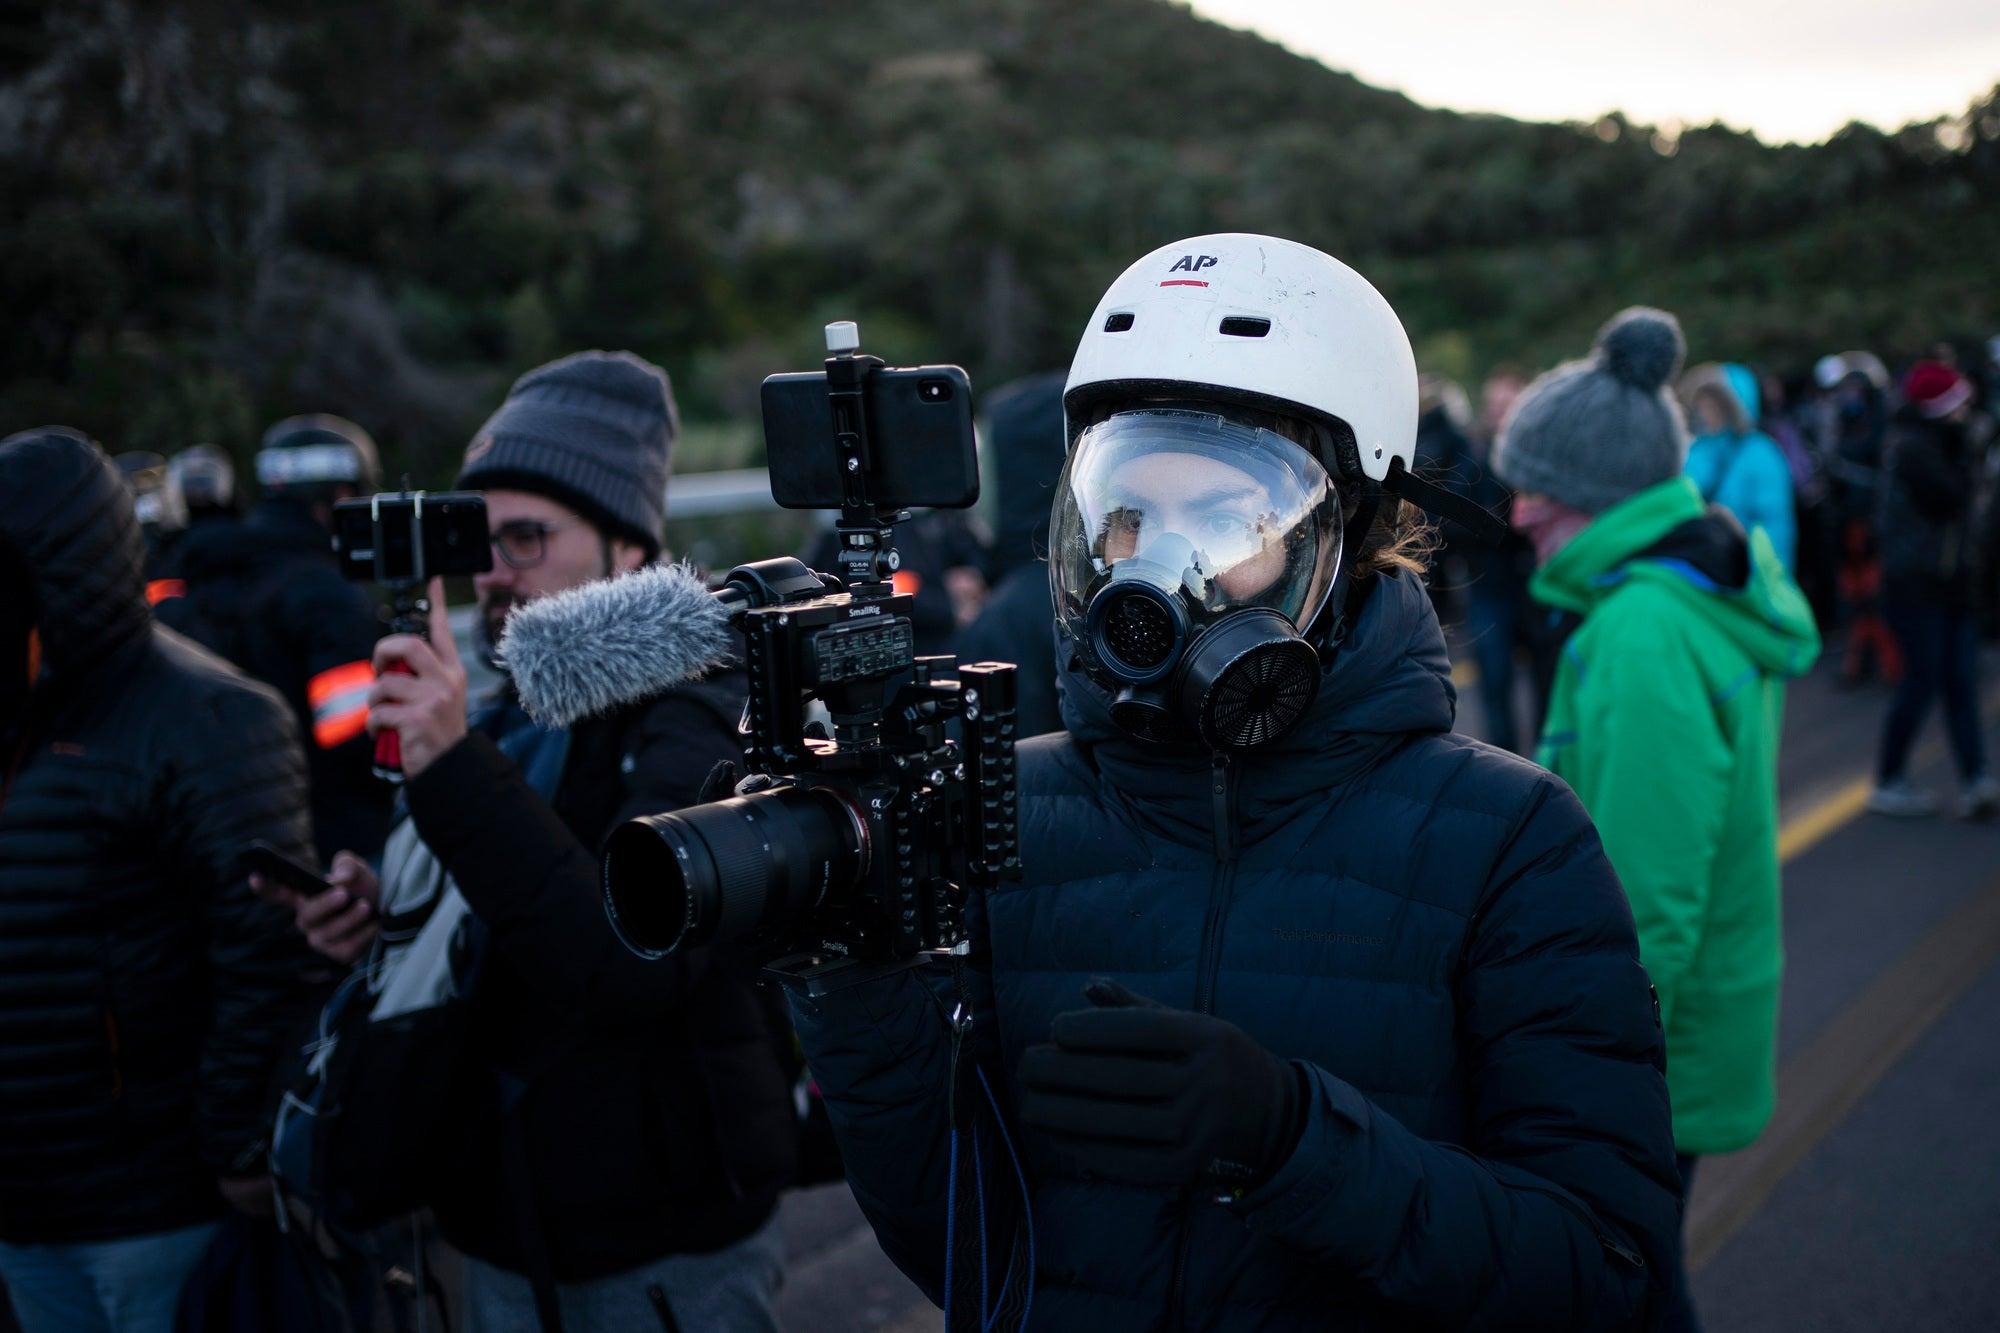 AP-video-journalist-Renata-Brito-covers-protests-at-the-Spain-France-border--Nov.-12--2019--using-Sony-equipment--AP-Photo-.jpg